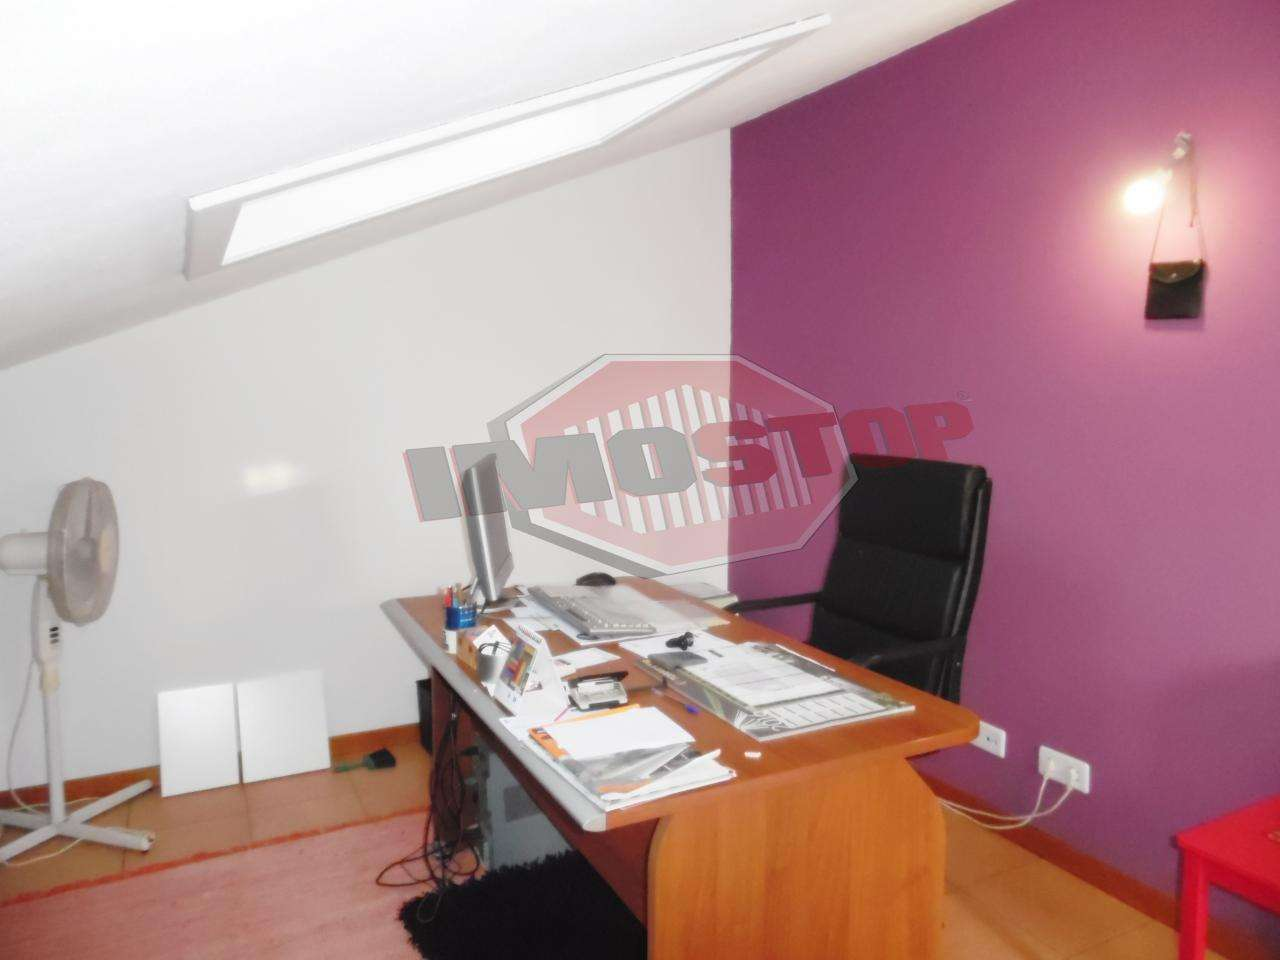 Apartamento para comprar, Oiã, Oliveira do Bairro, Aveiro - Foto 23